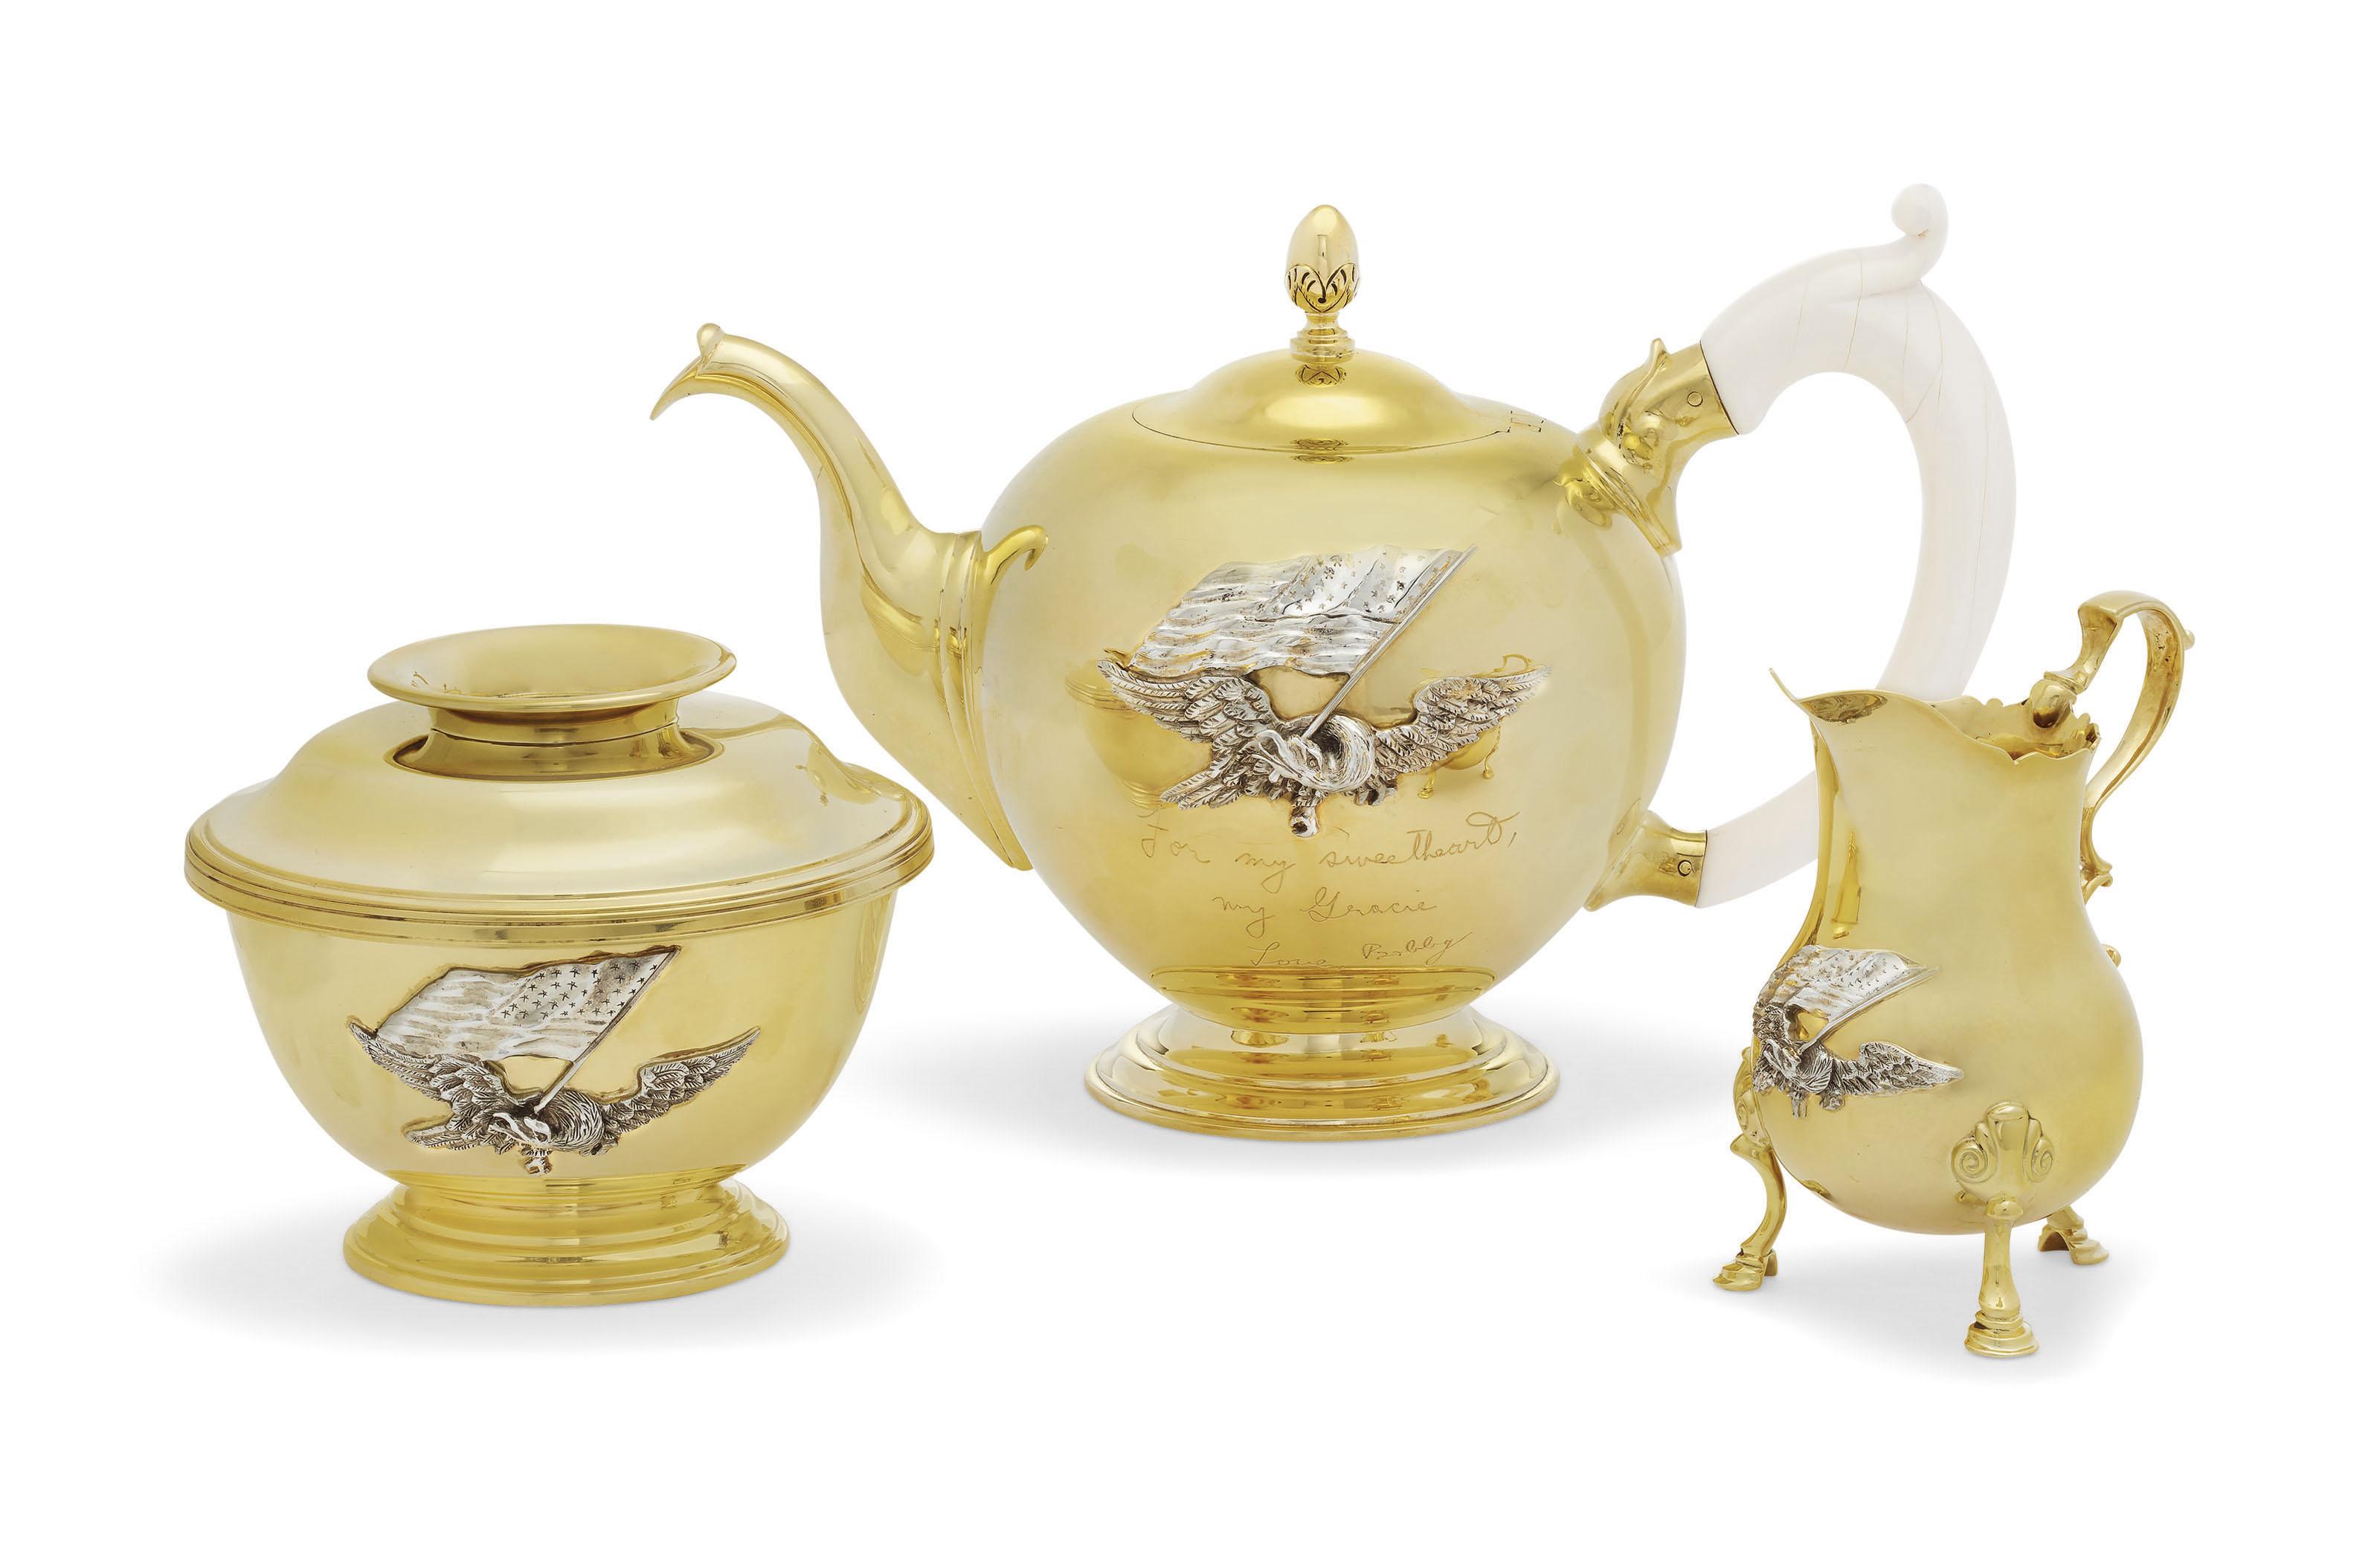 AN AMERICAN SILVER-MOUNTED 18-KARAT GOLD THREE-PIECE TEA SET